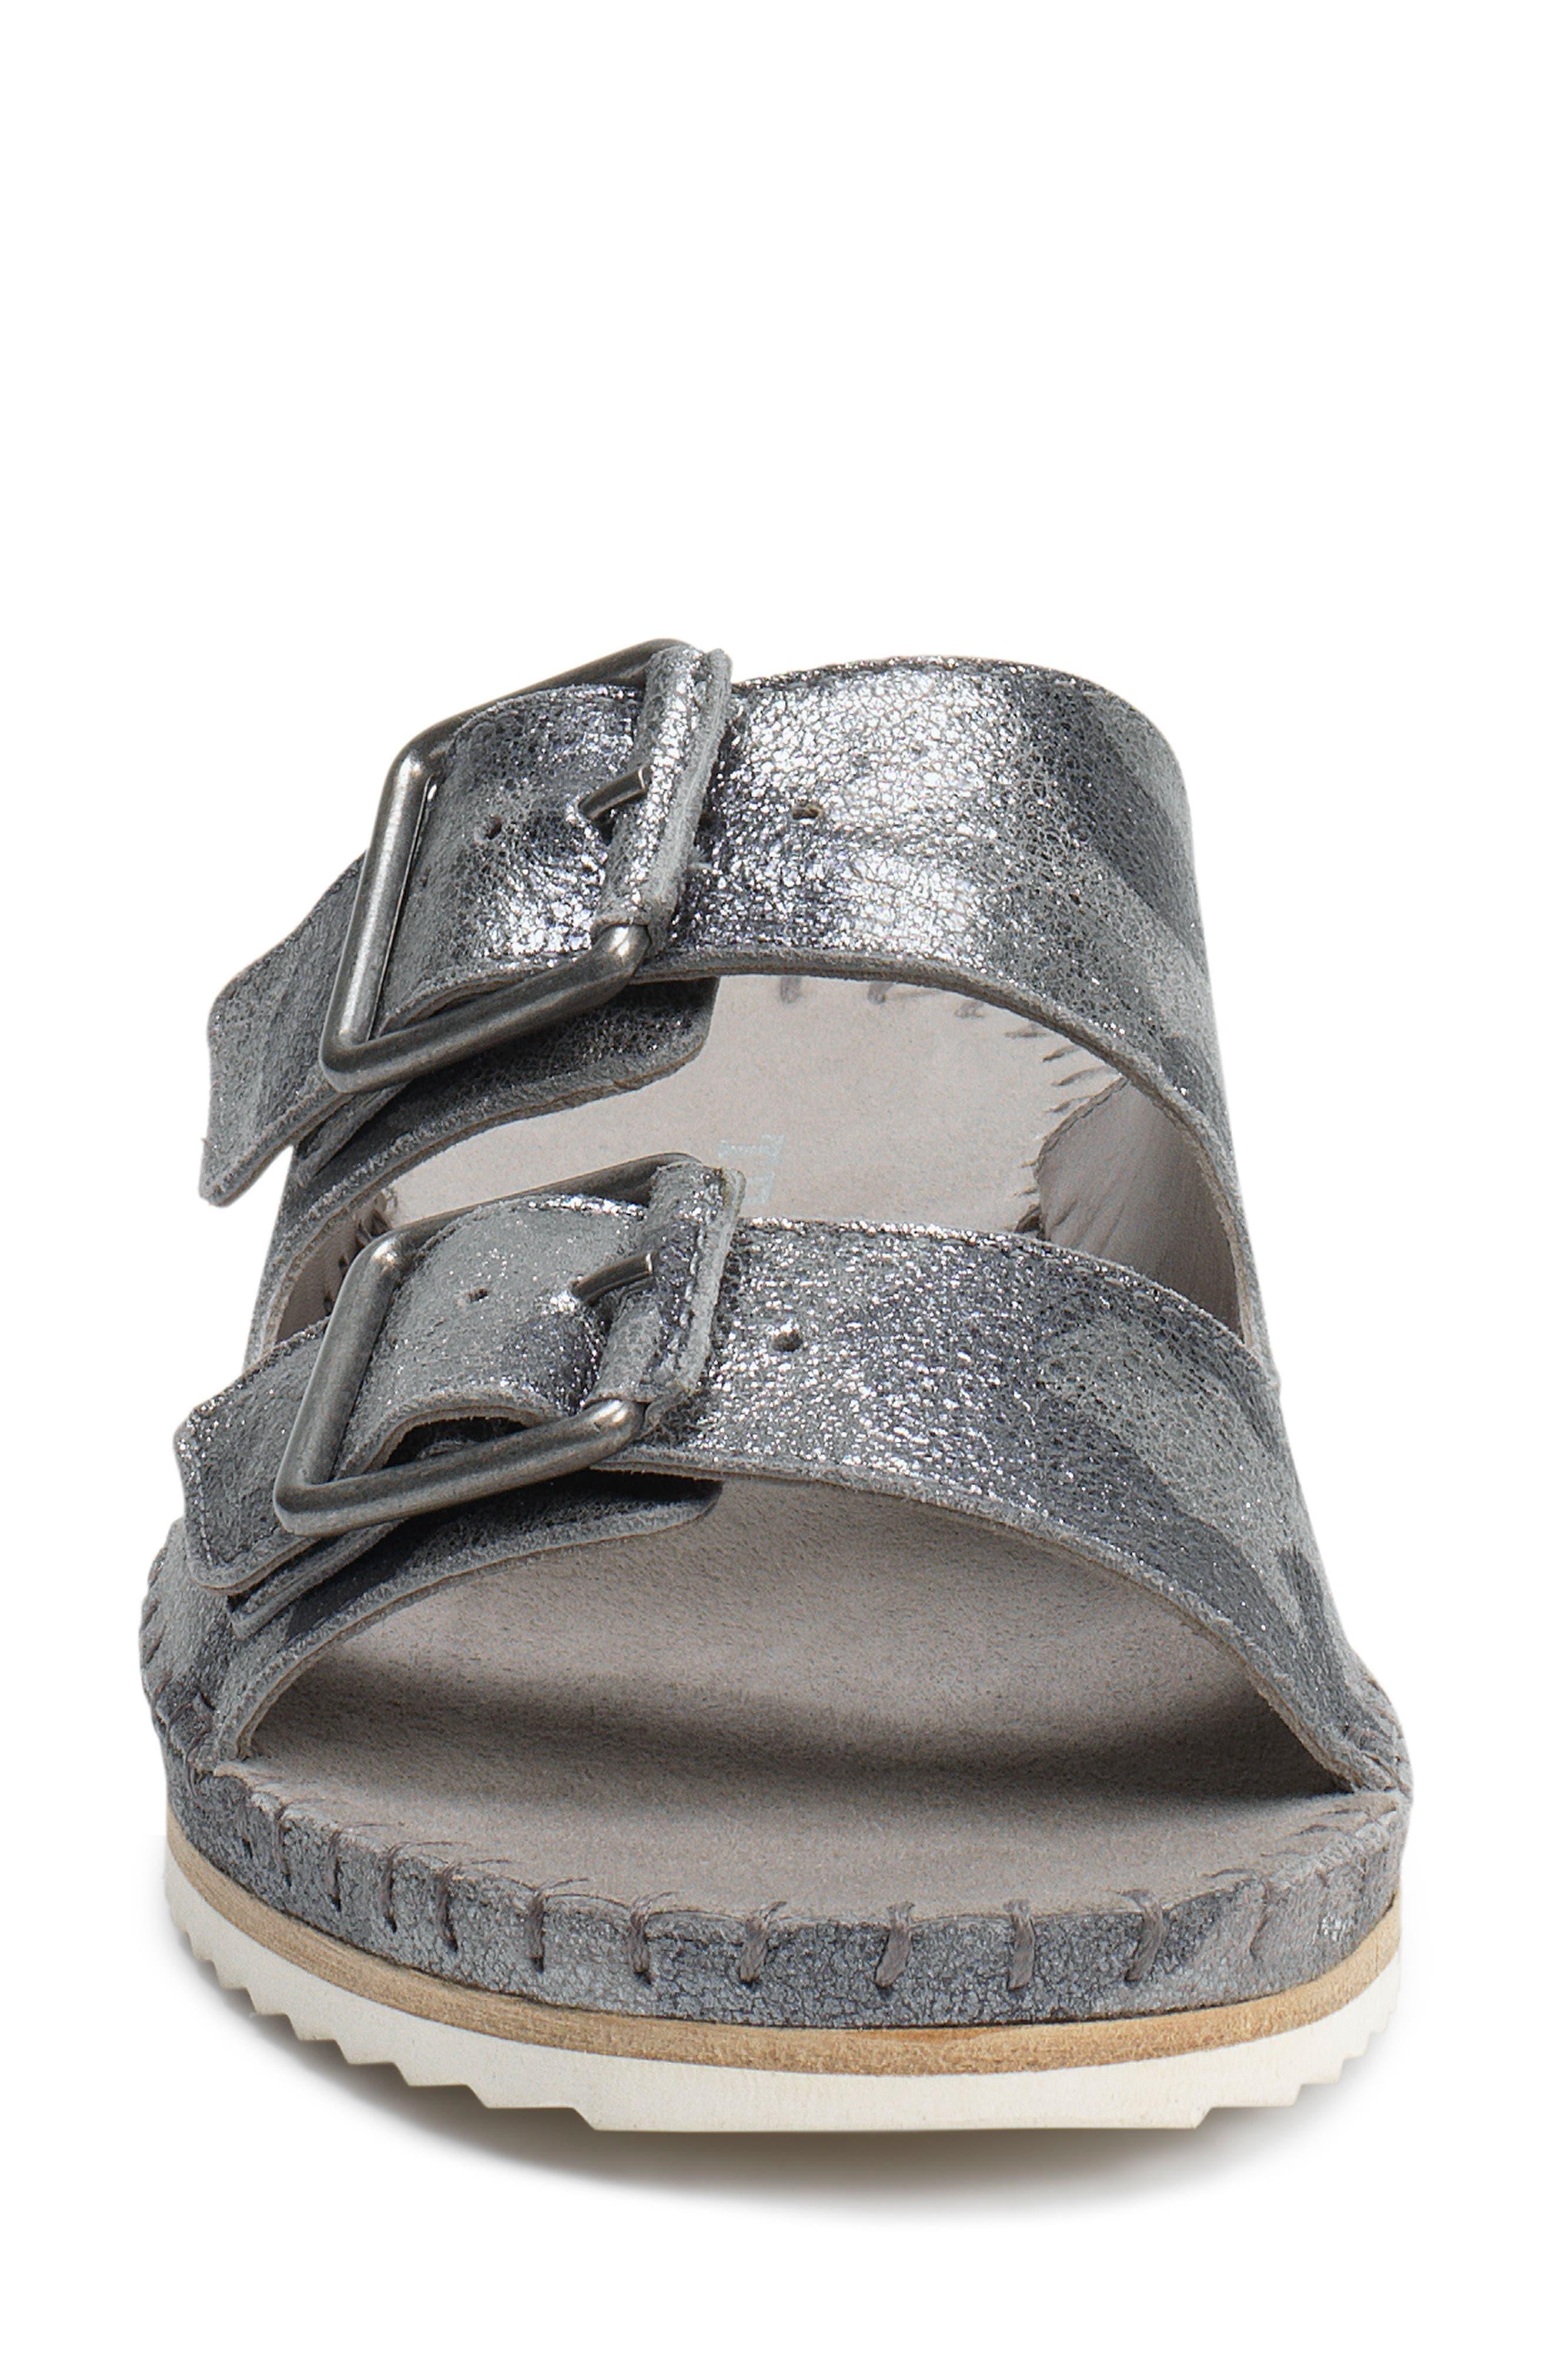 Carli Slide Sandal,                             Alternate thumbnail 3, color,                             Pewter Camo Metallic Suede